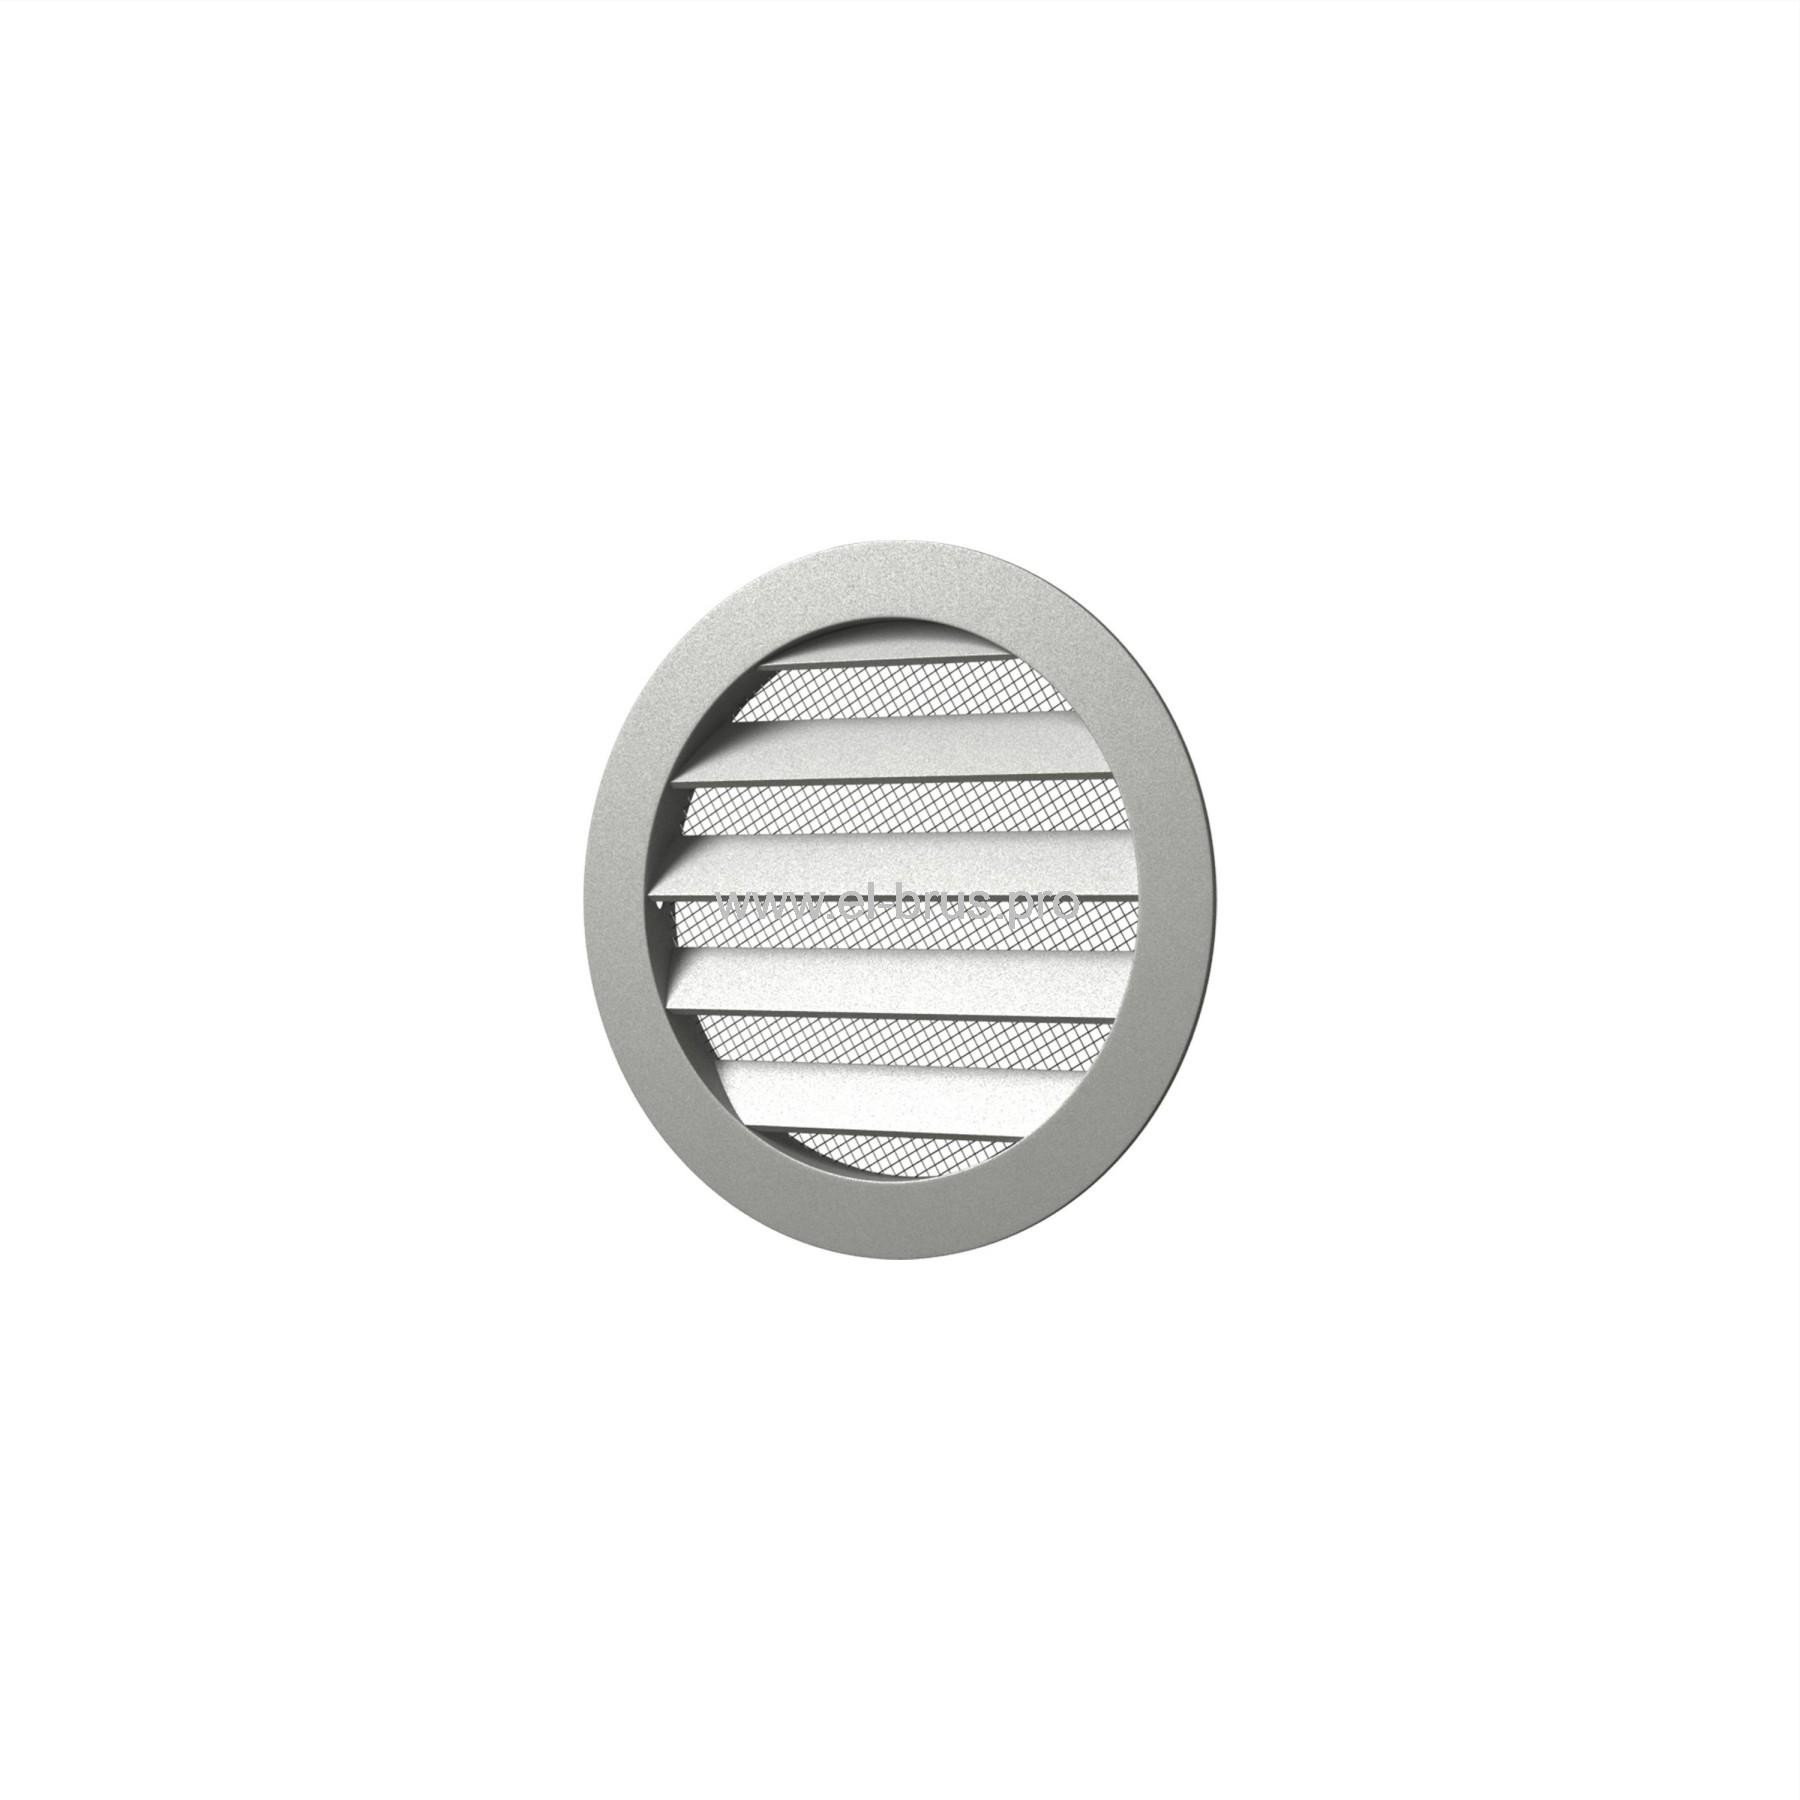 Решетка вент. круглая с сеткой Ø125мм и фланцем Ø100мм ERA 10РКМ